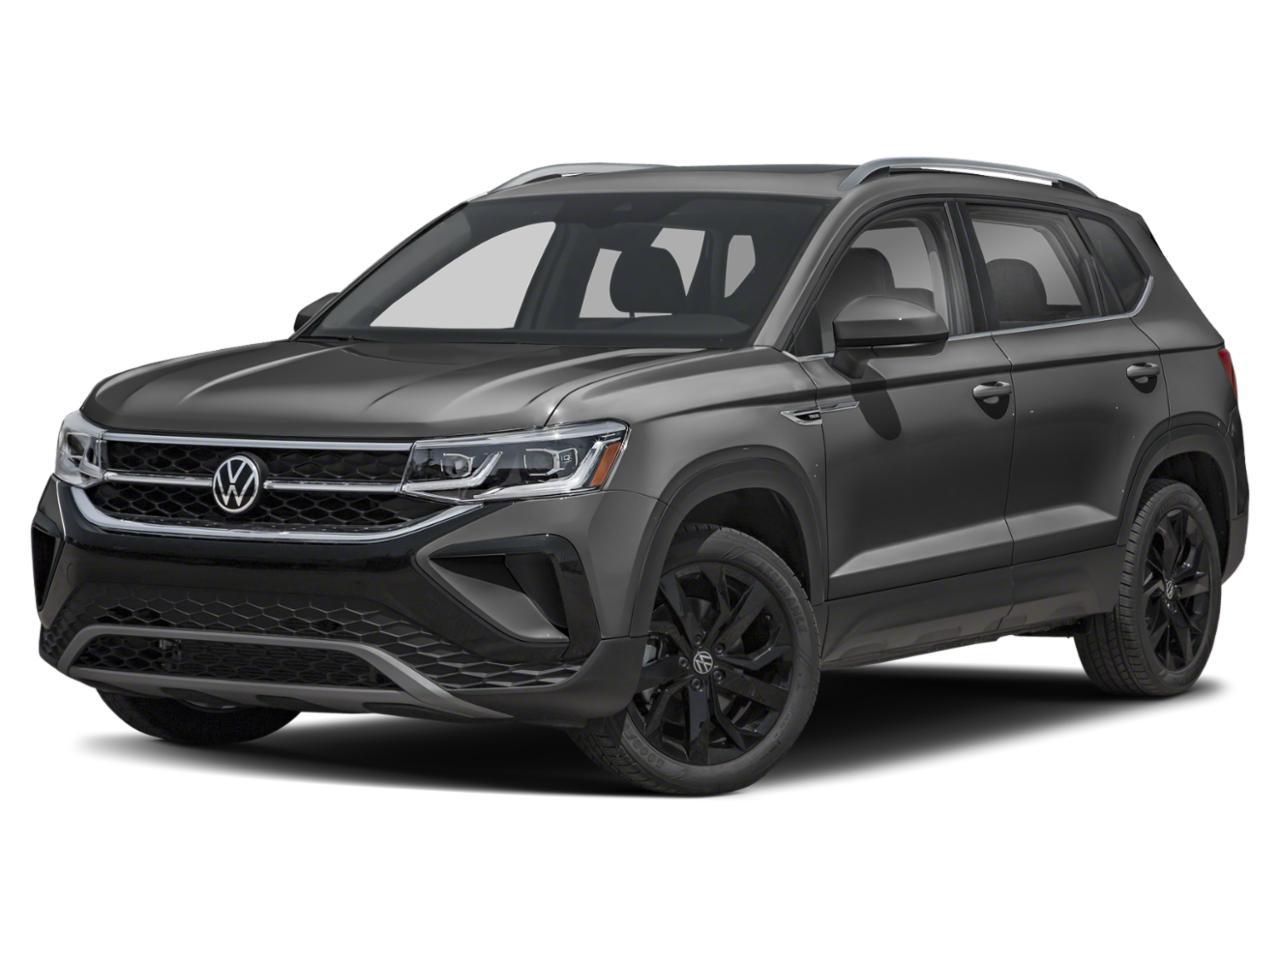 2022 Volkswagen Taos Vehicle Photo in Oshkosh, WI 54904